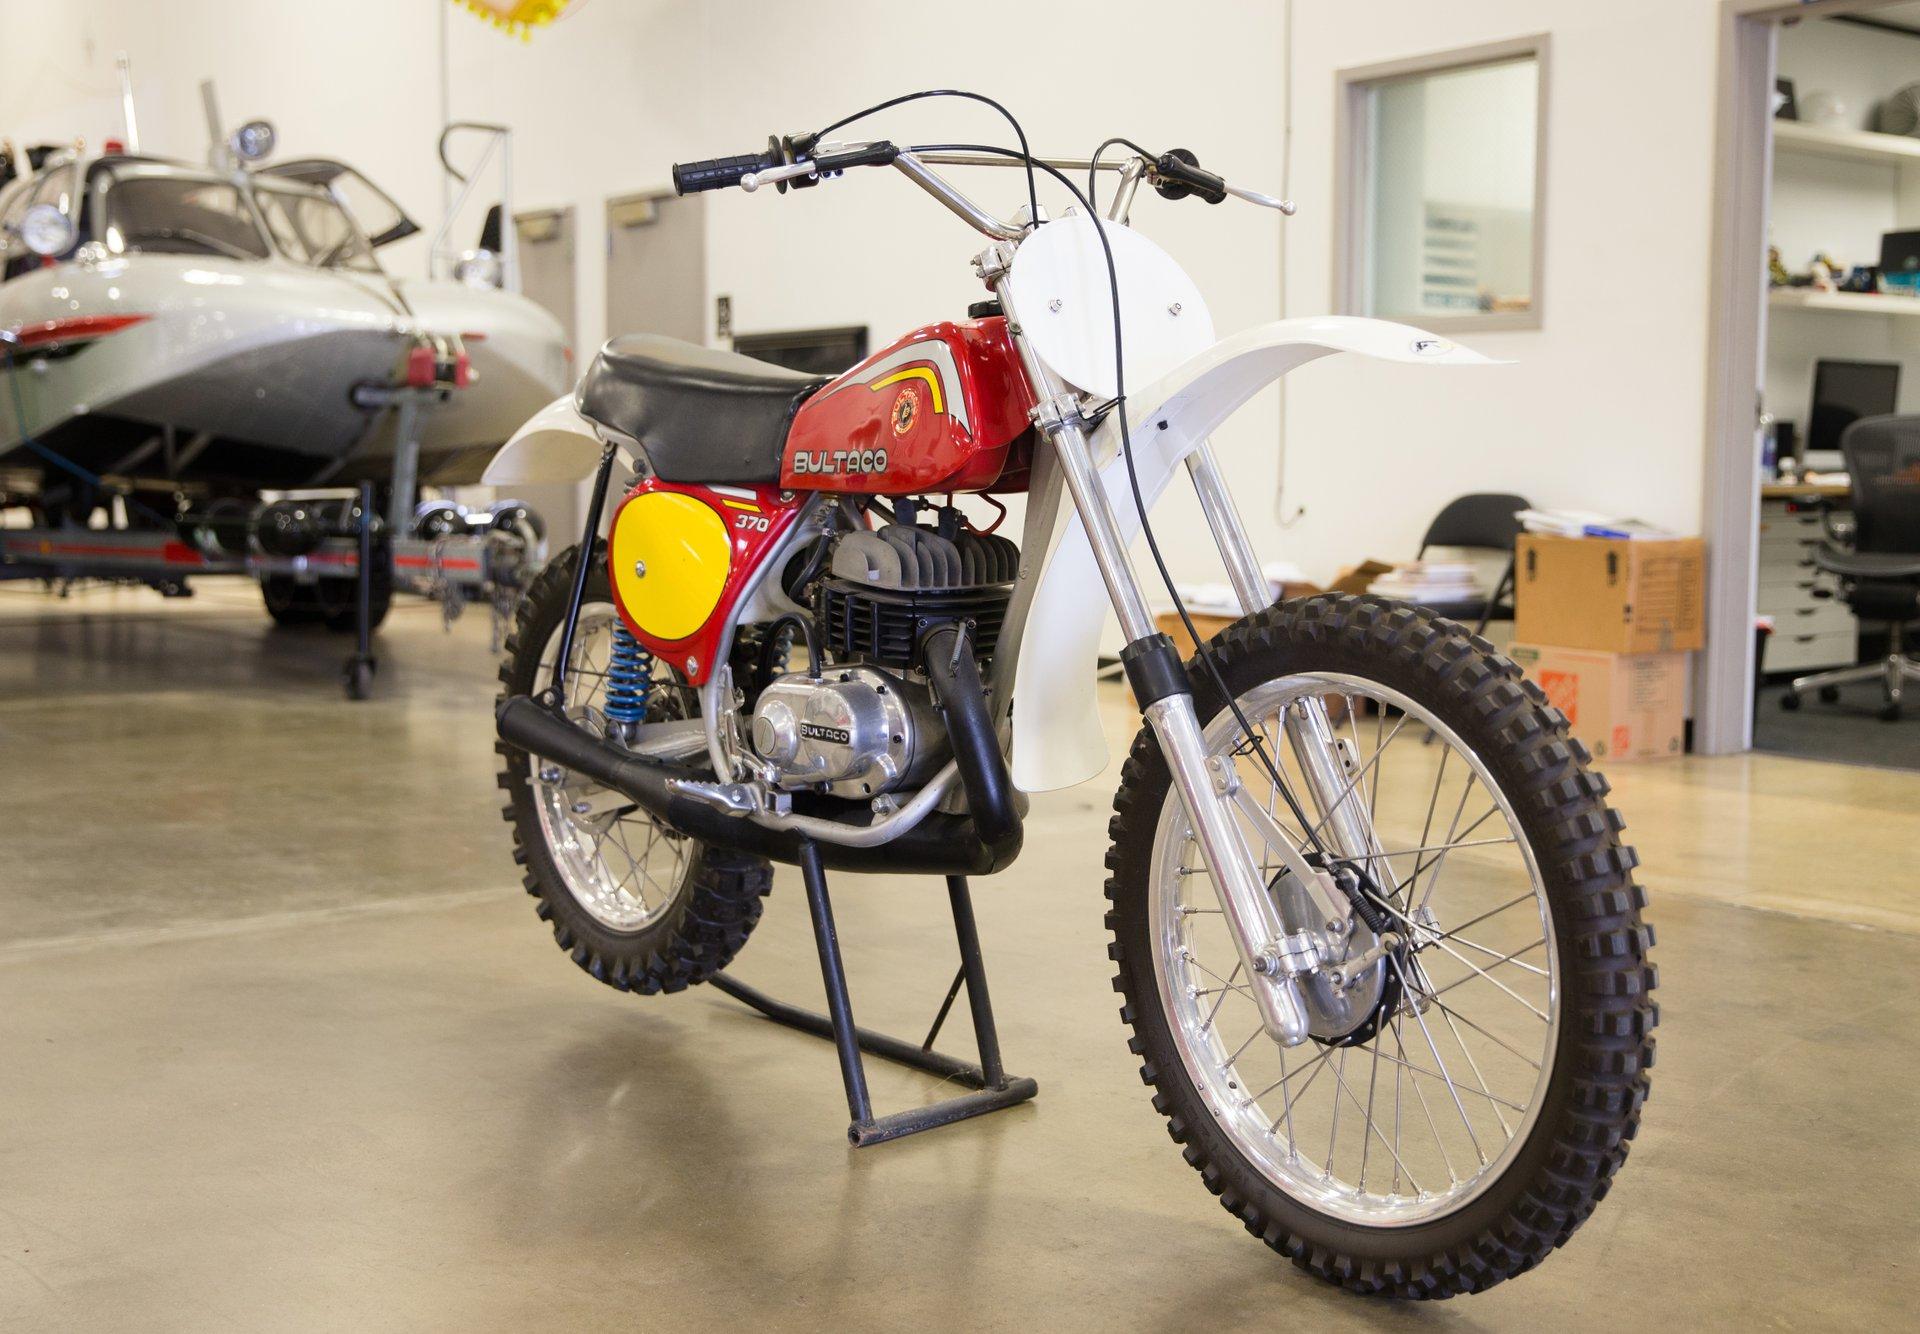 1977 Bultaco #193 Pursang 370 MK 10 for sale #2577 | Motorious